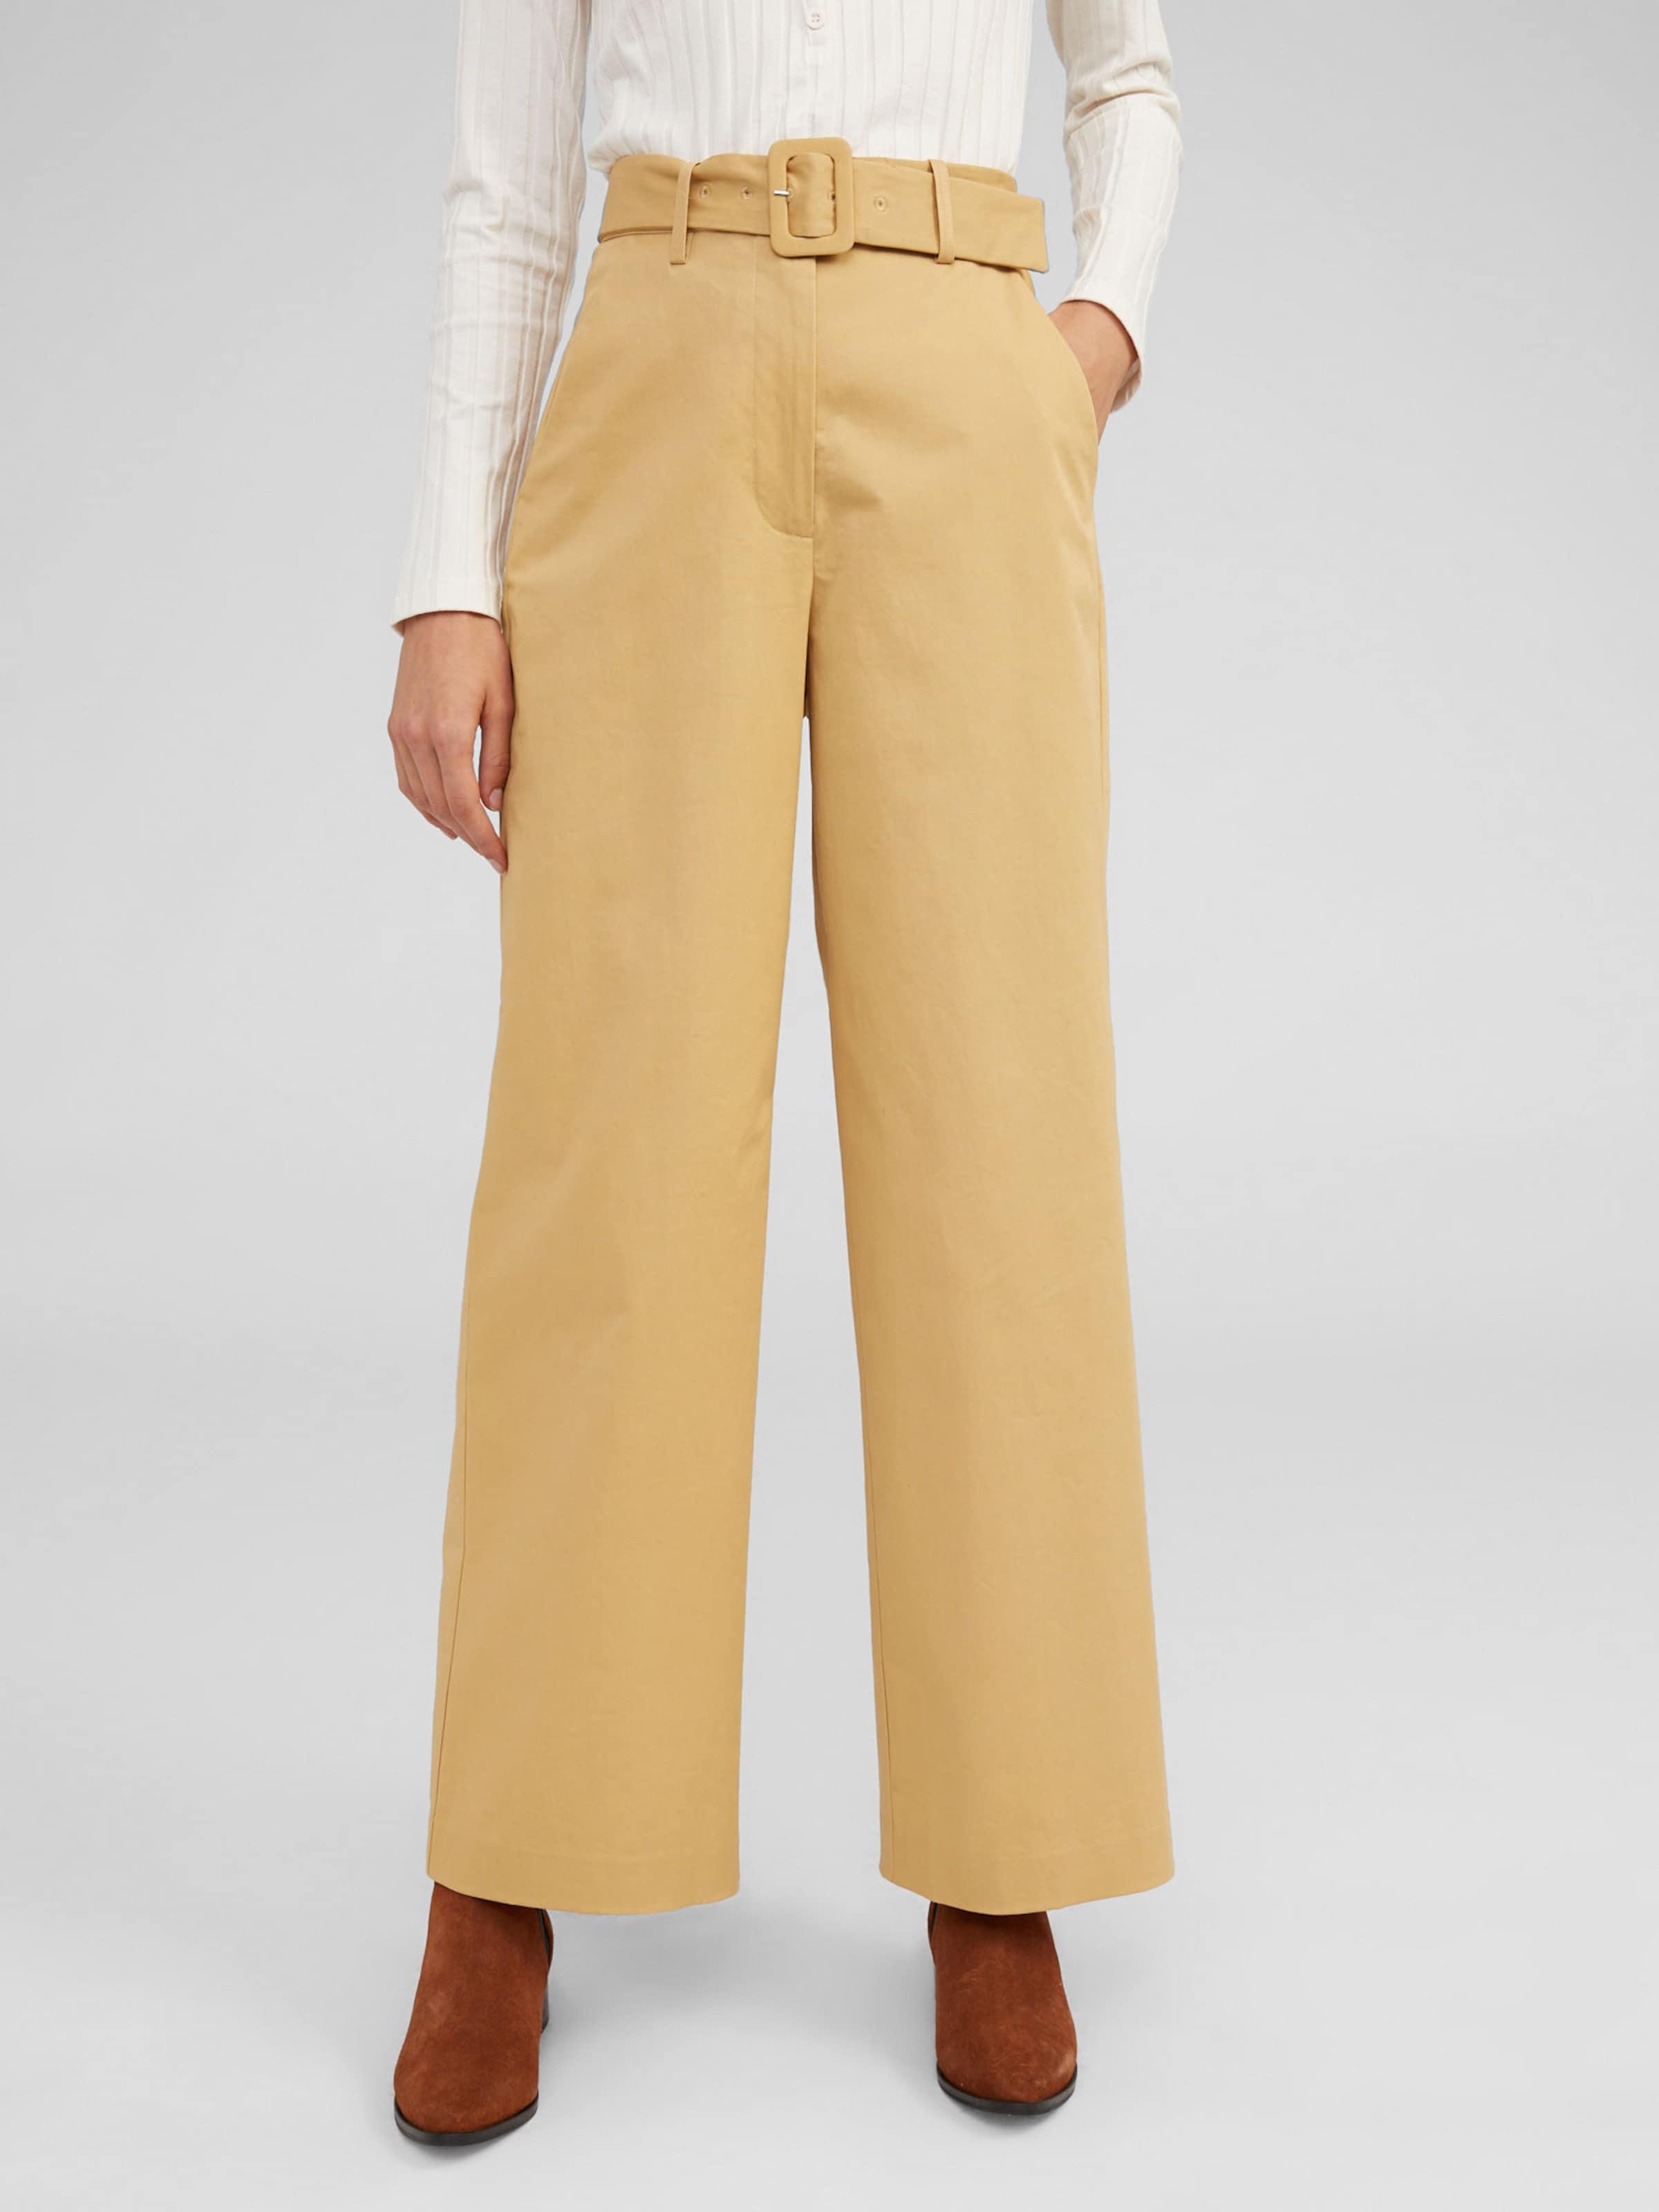 Pantalon 'indra' Noisette 'indra' Pantalon Edited 'indra' Edited Pantalon En En Noisette Edited IgYyvf6mb7